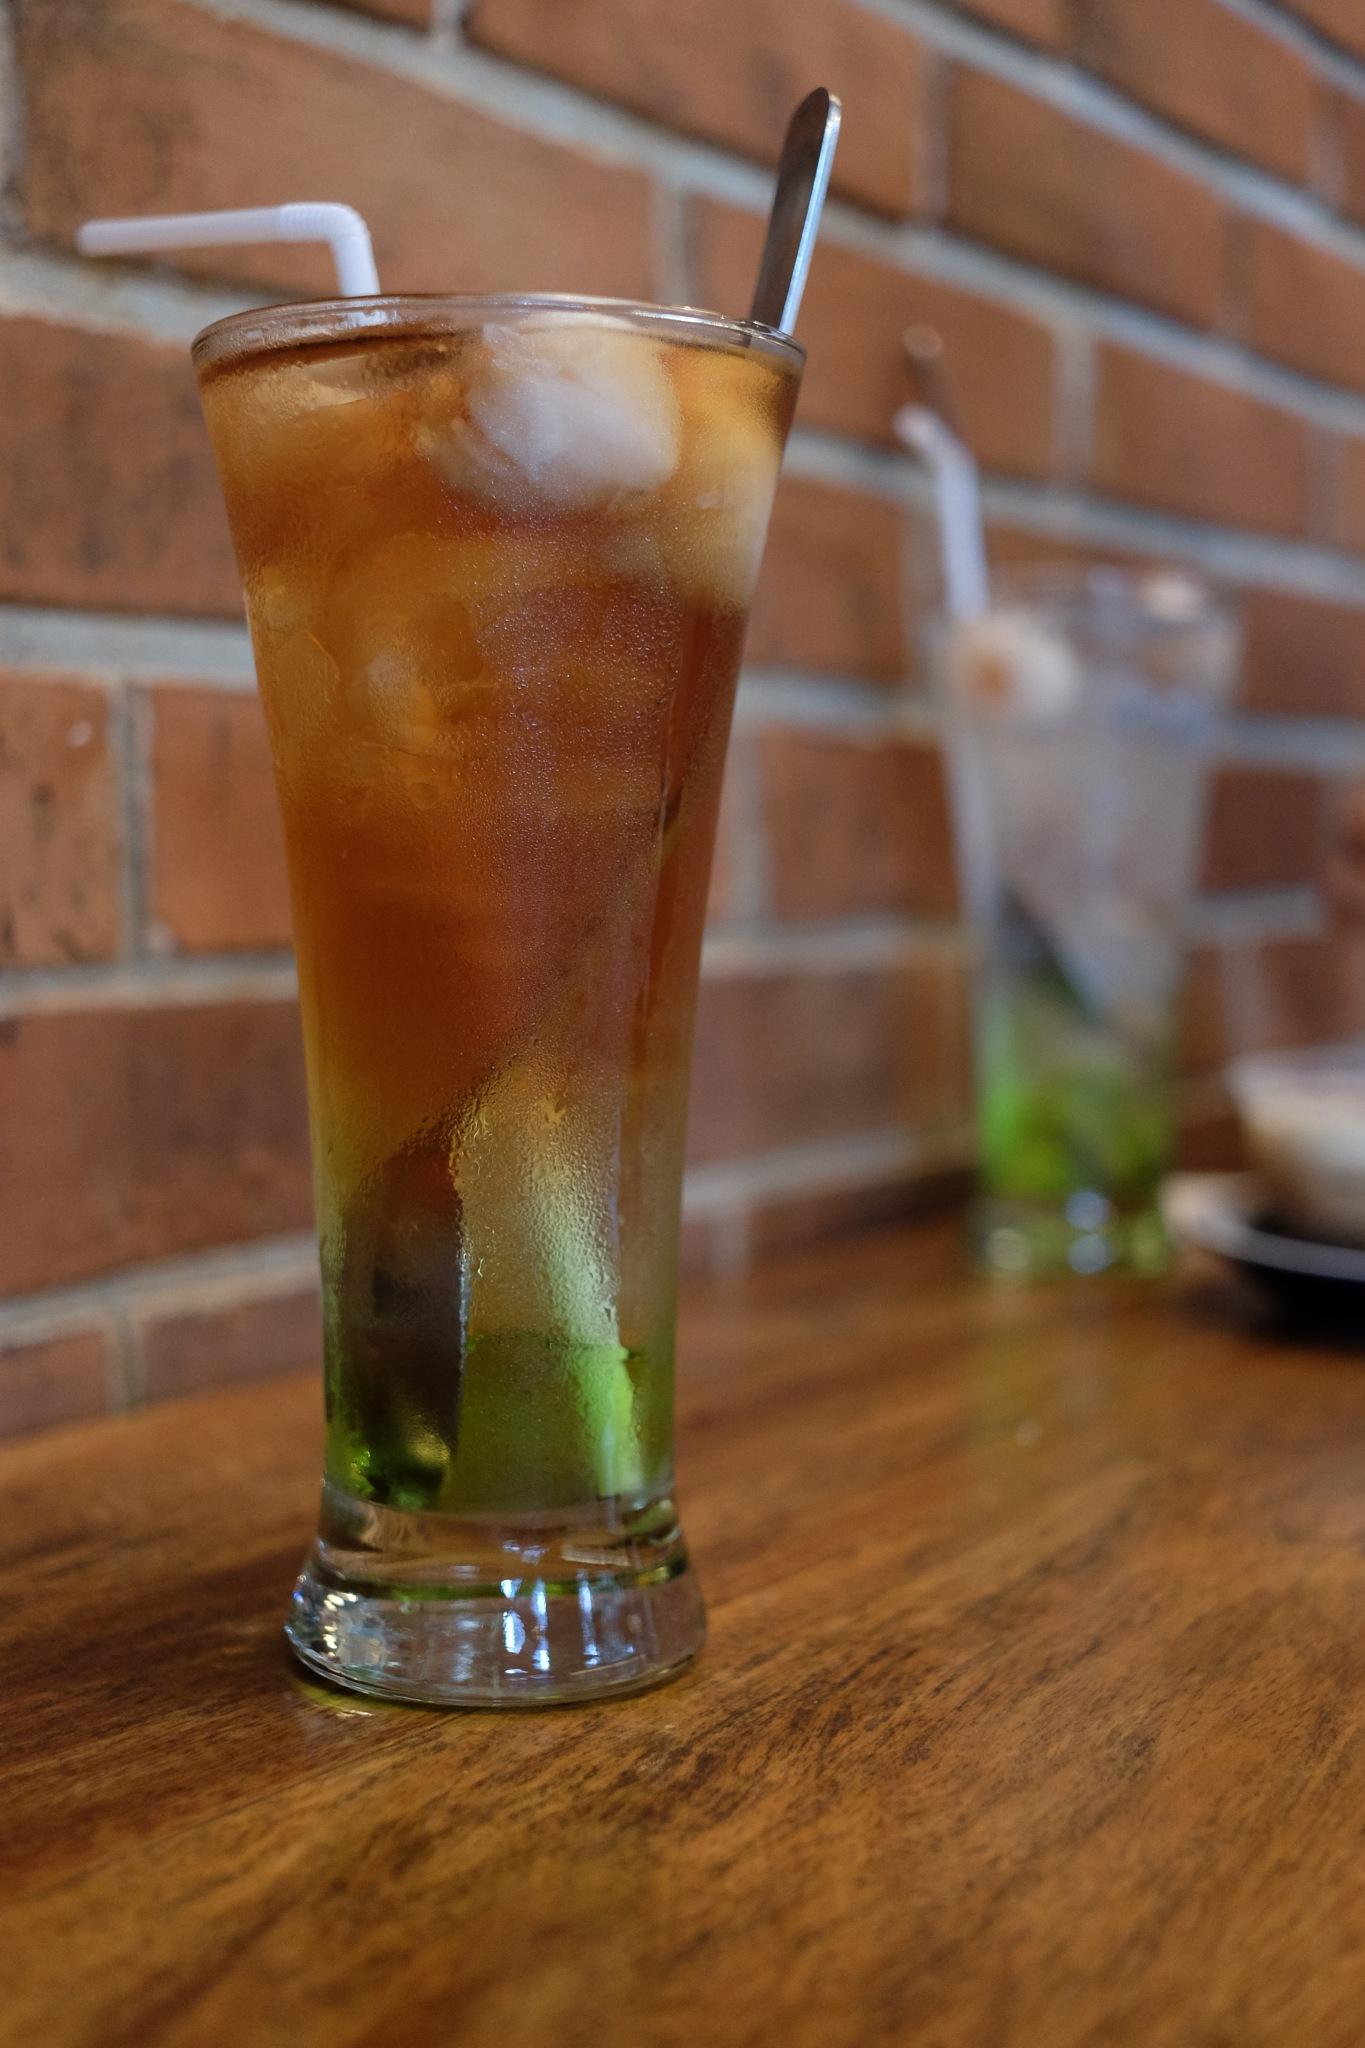 Lychee Tea by Lintar Yulianto